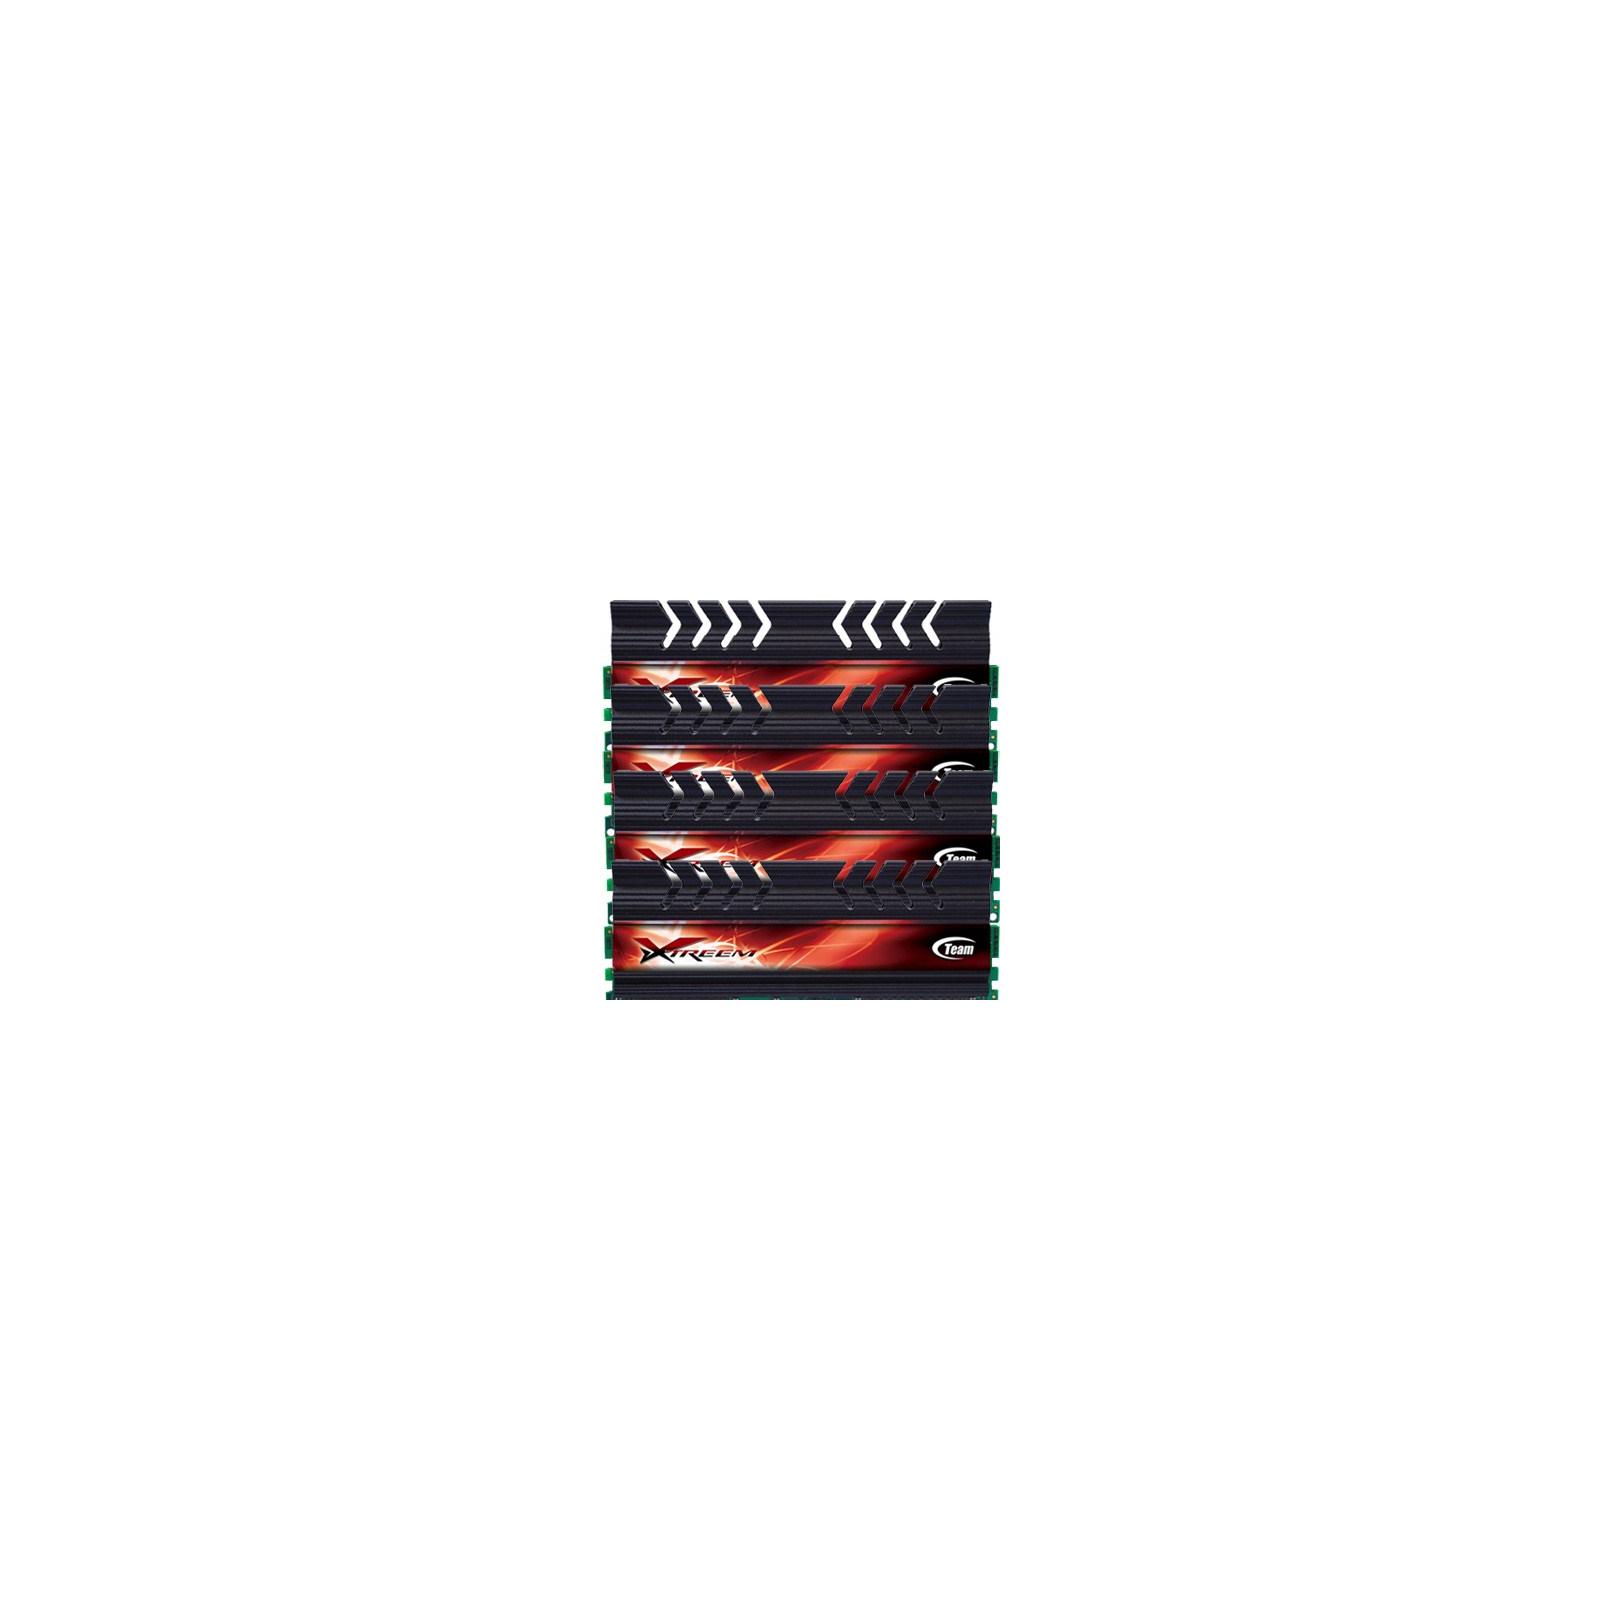 Модуль памяти для компьютера DDR3 16GB (4x4GB) 2400 MHz Team (TXD316G2400HC10QQC01)